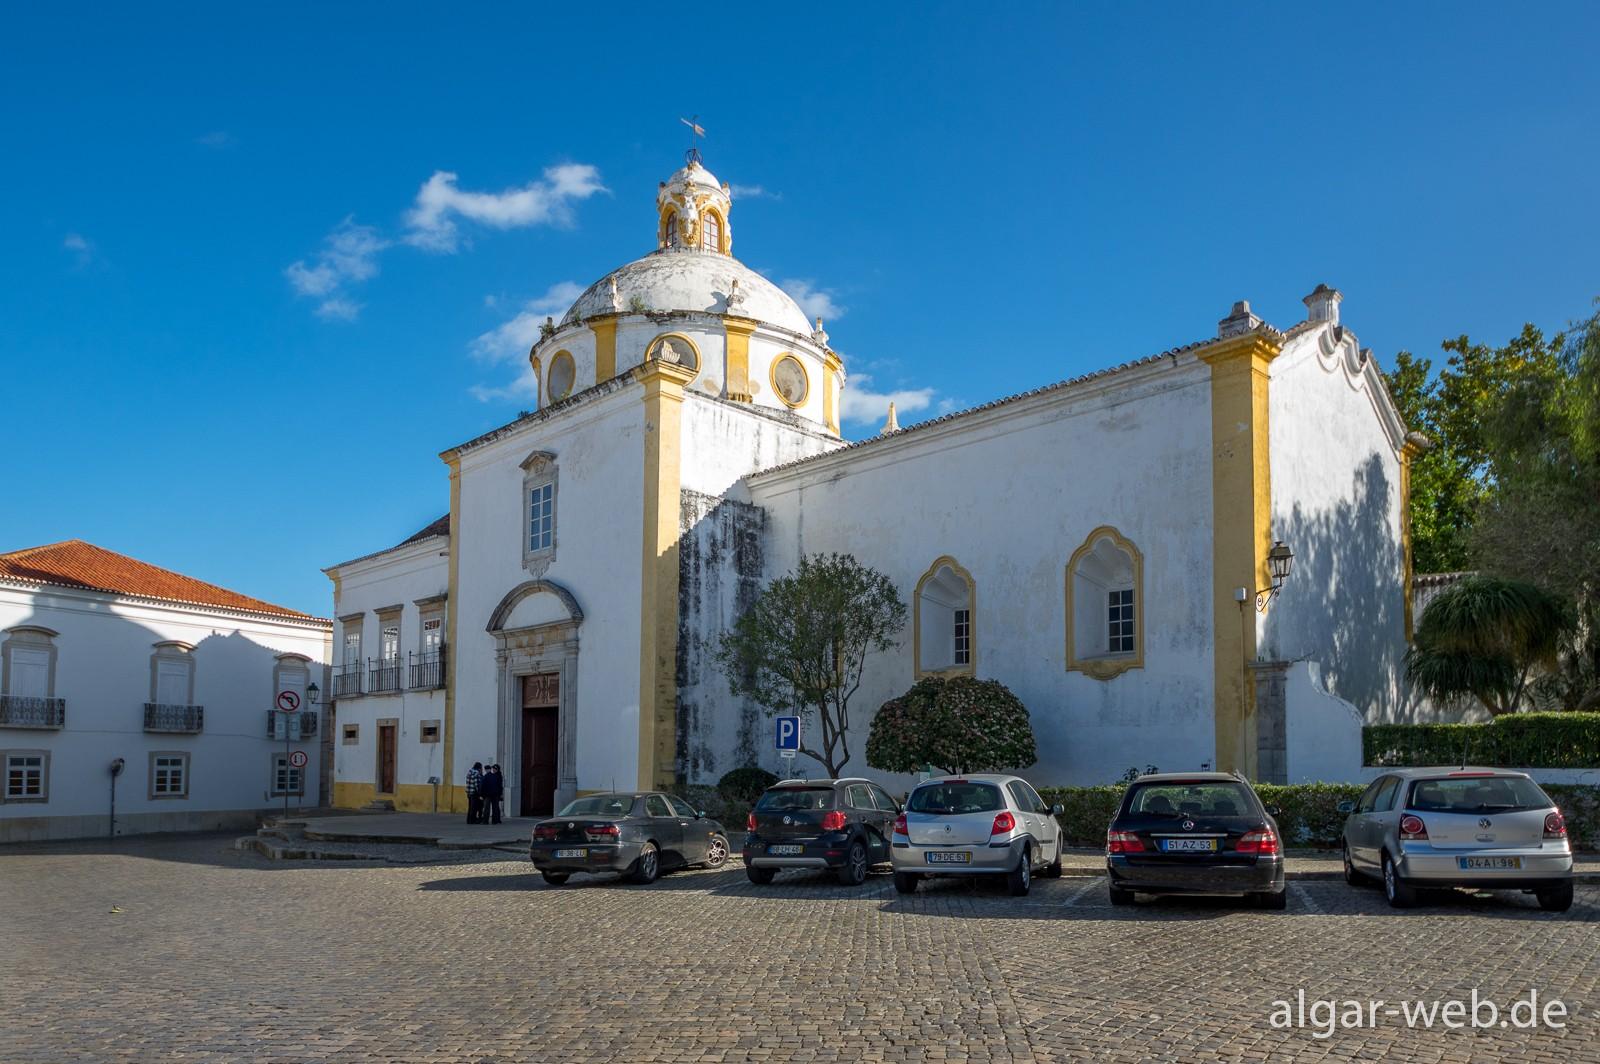 Tavira - Altstadt-Impressionen